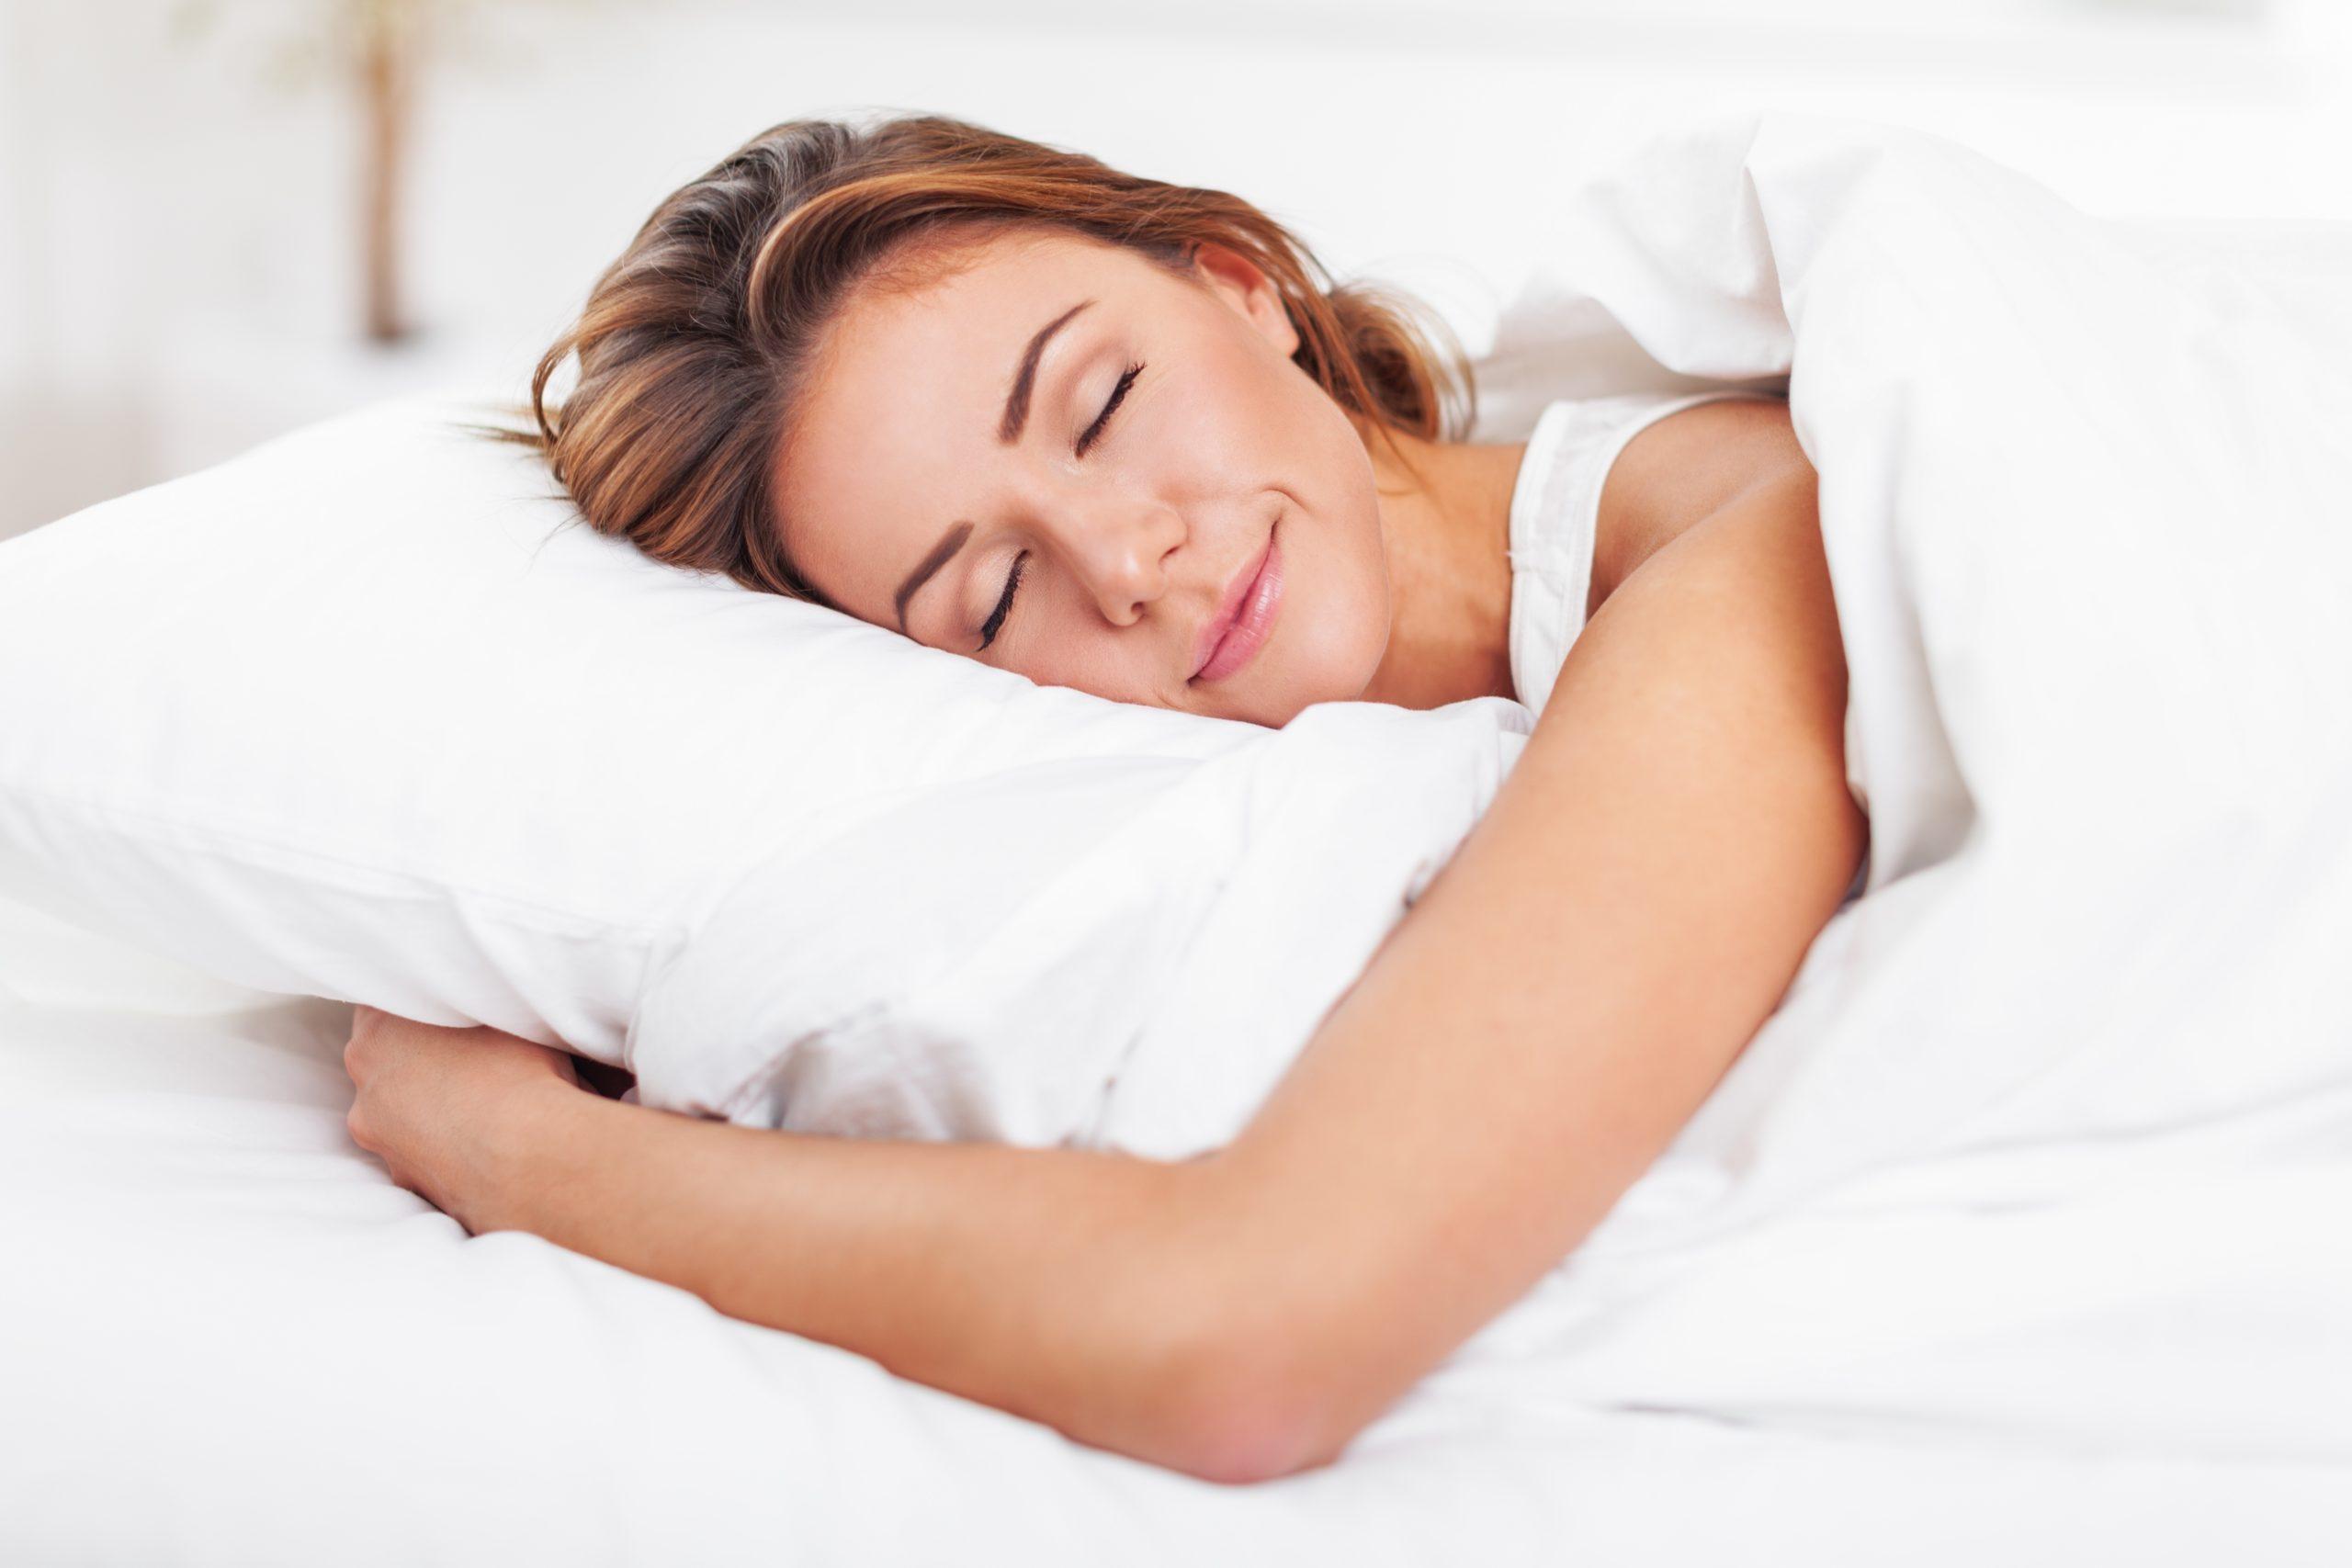 woman sleeping on white sheets